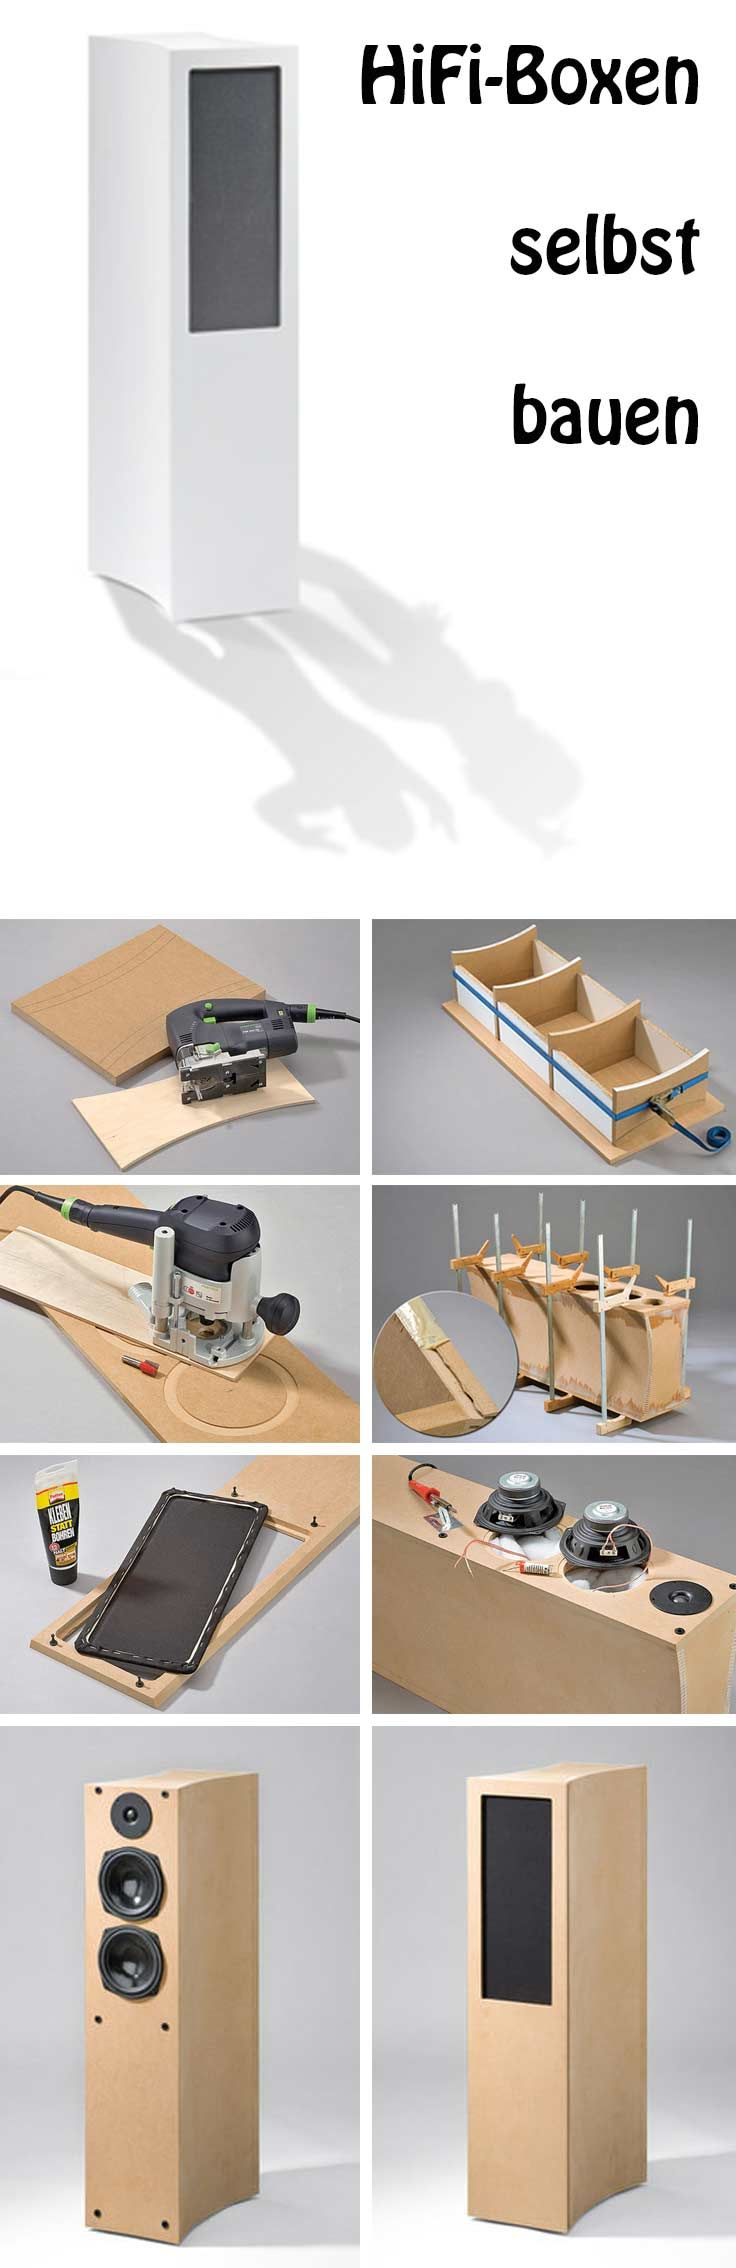 mit hilfe unserer bauanleitung kann man hifi boxen selbst. Black Bedroom Furniture Sets. Home Design Ideas